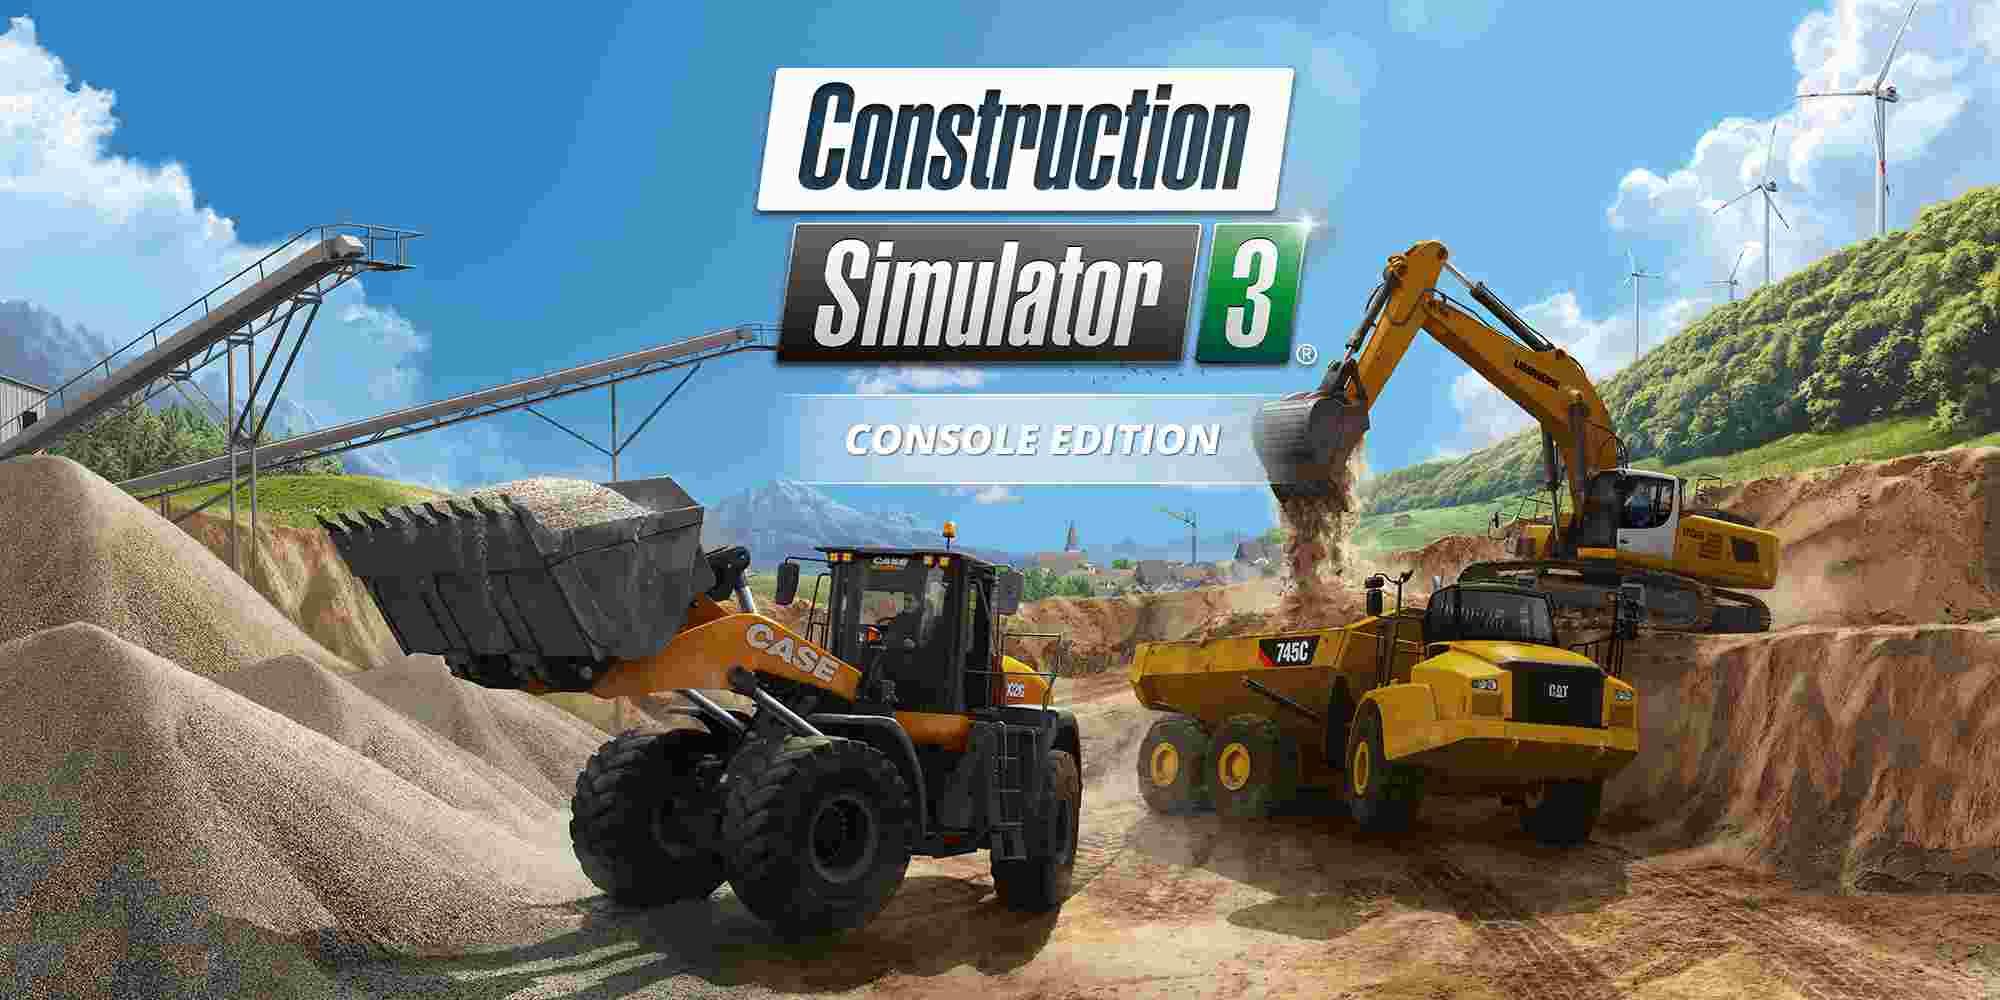 Construction Simulator 3 Mod Icon